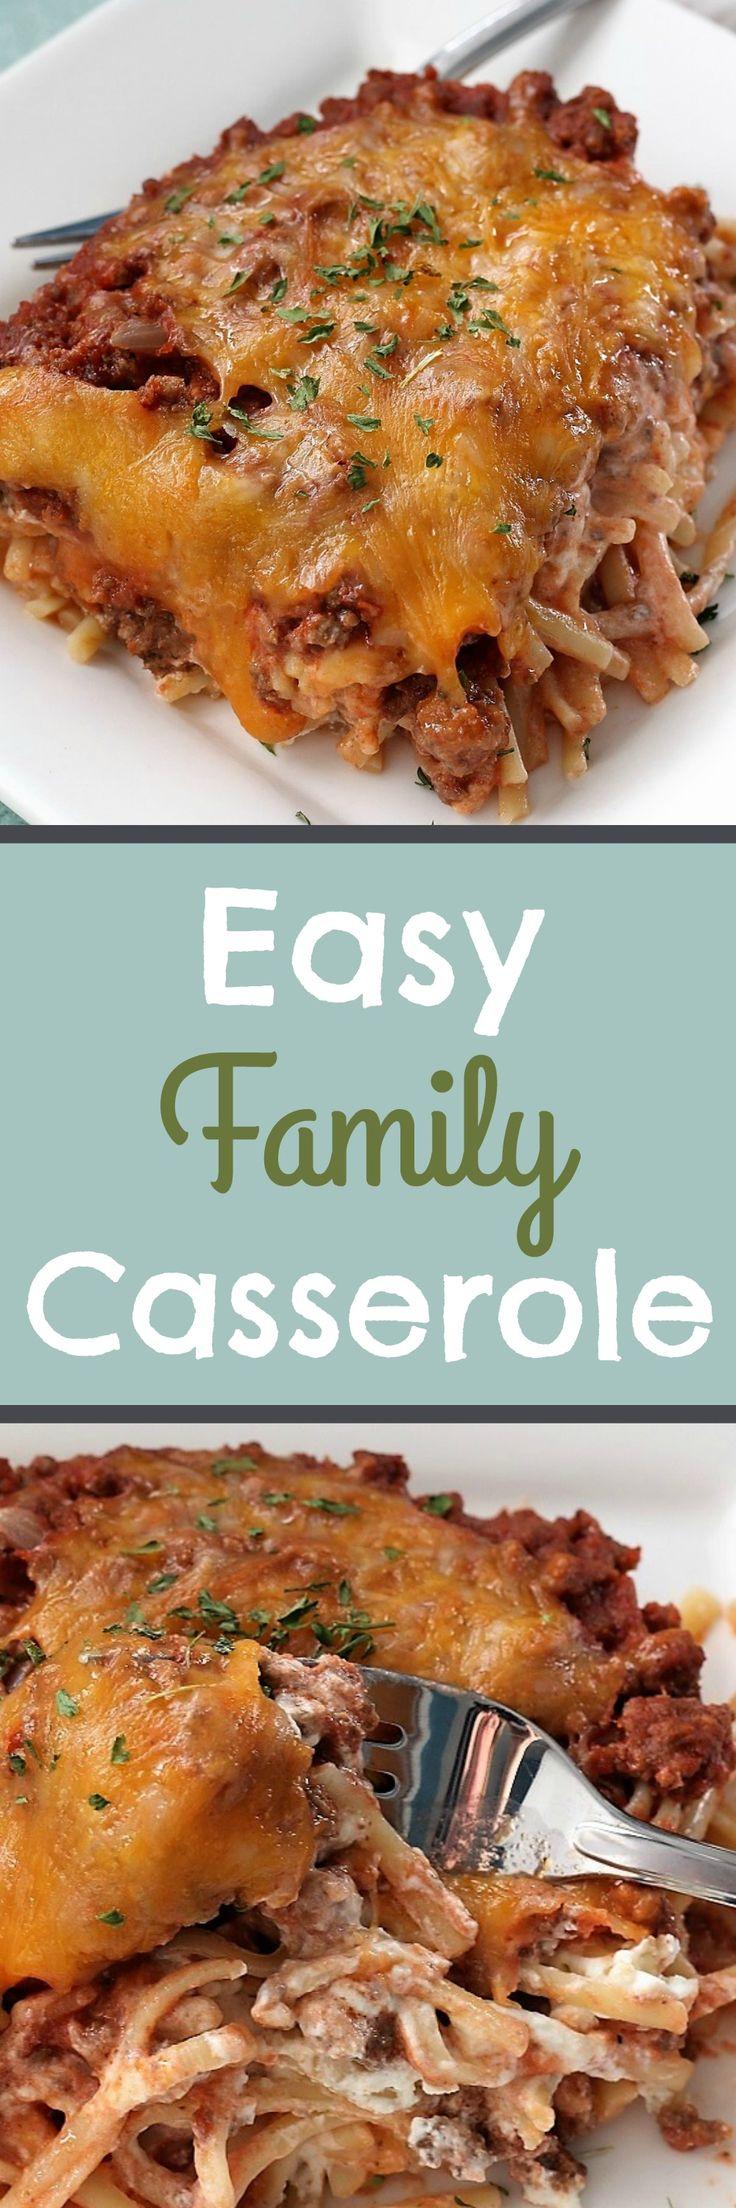 Easy Family Casserole , Recipe Treasures Blog